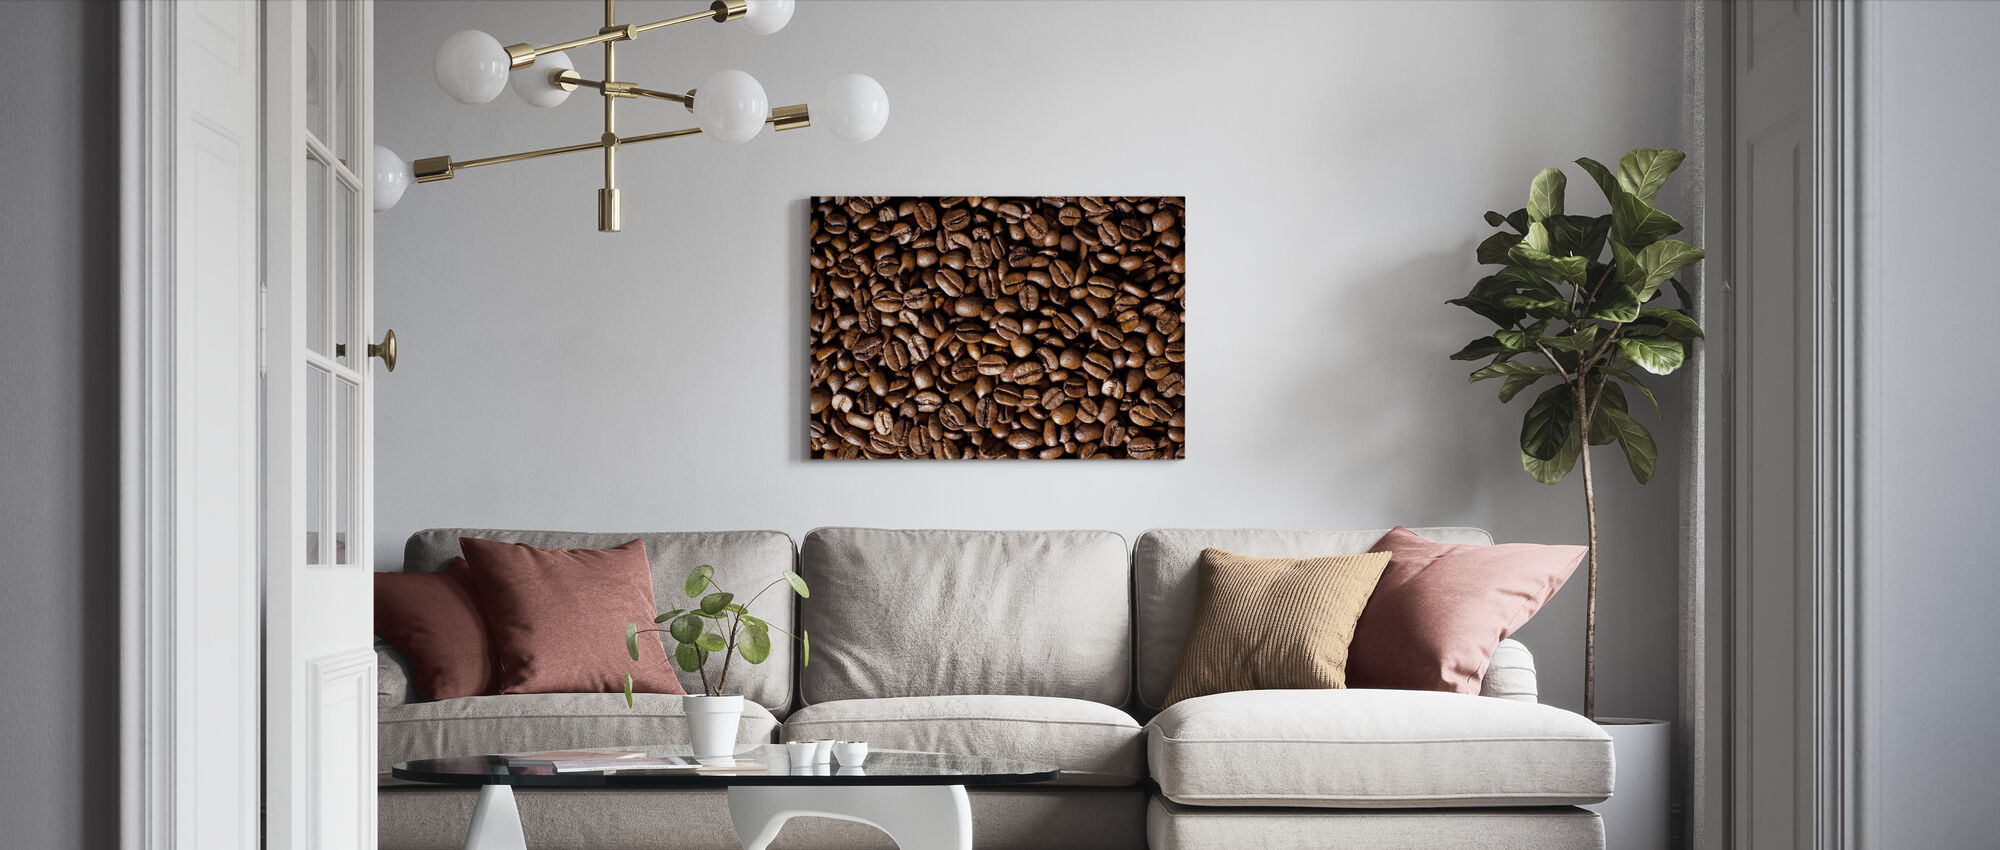 Koffiebonen - Canvas print - Woonkamer